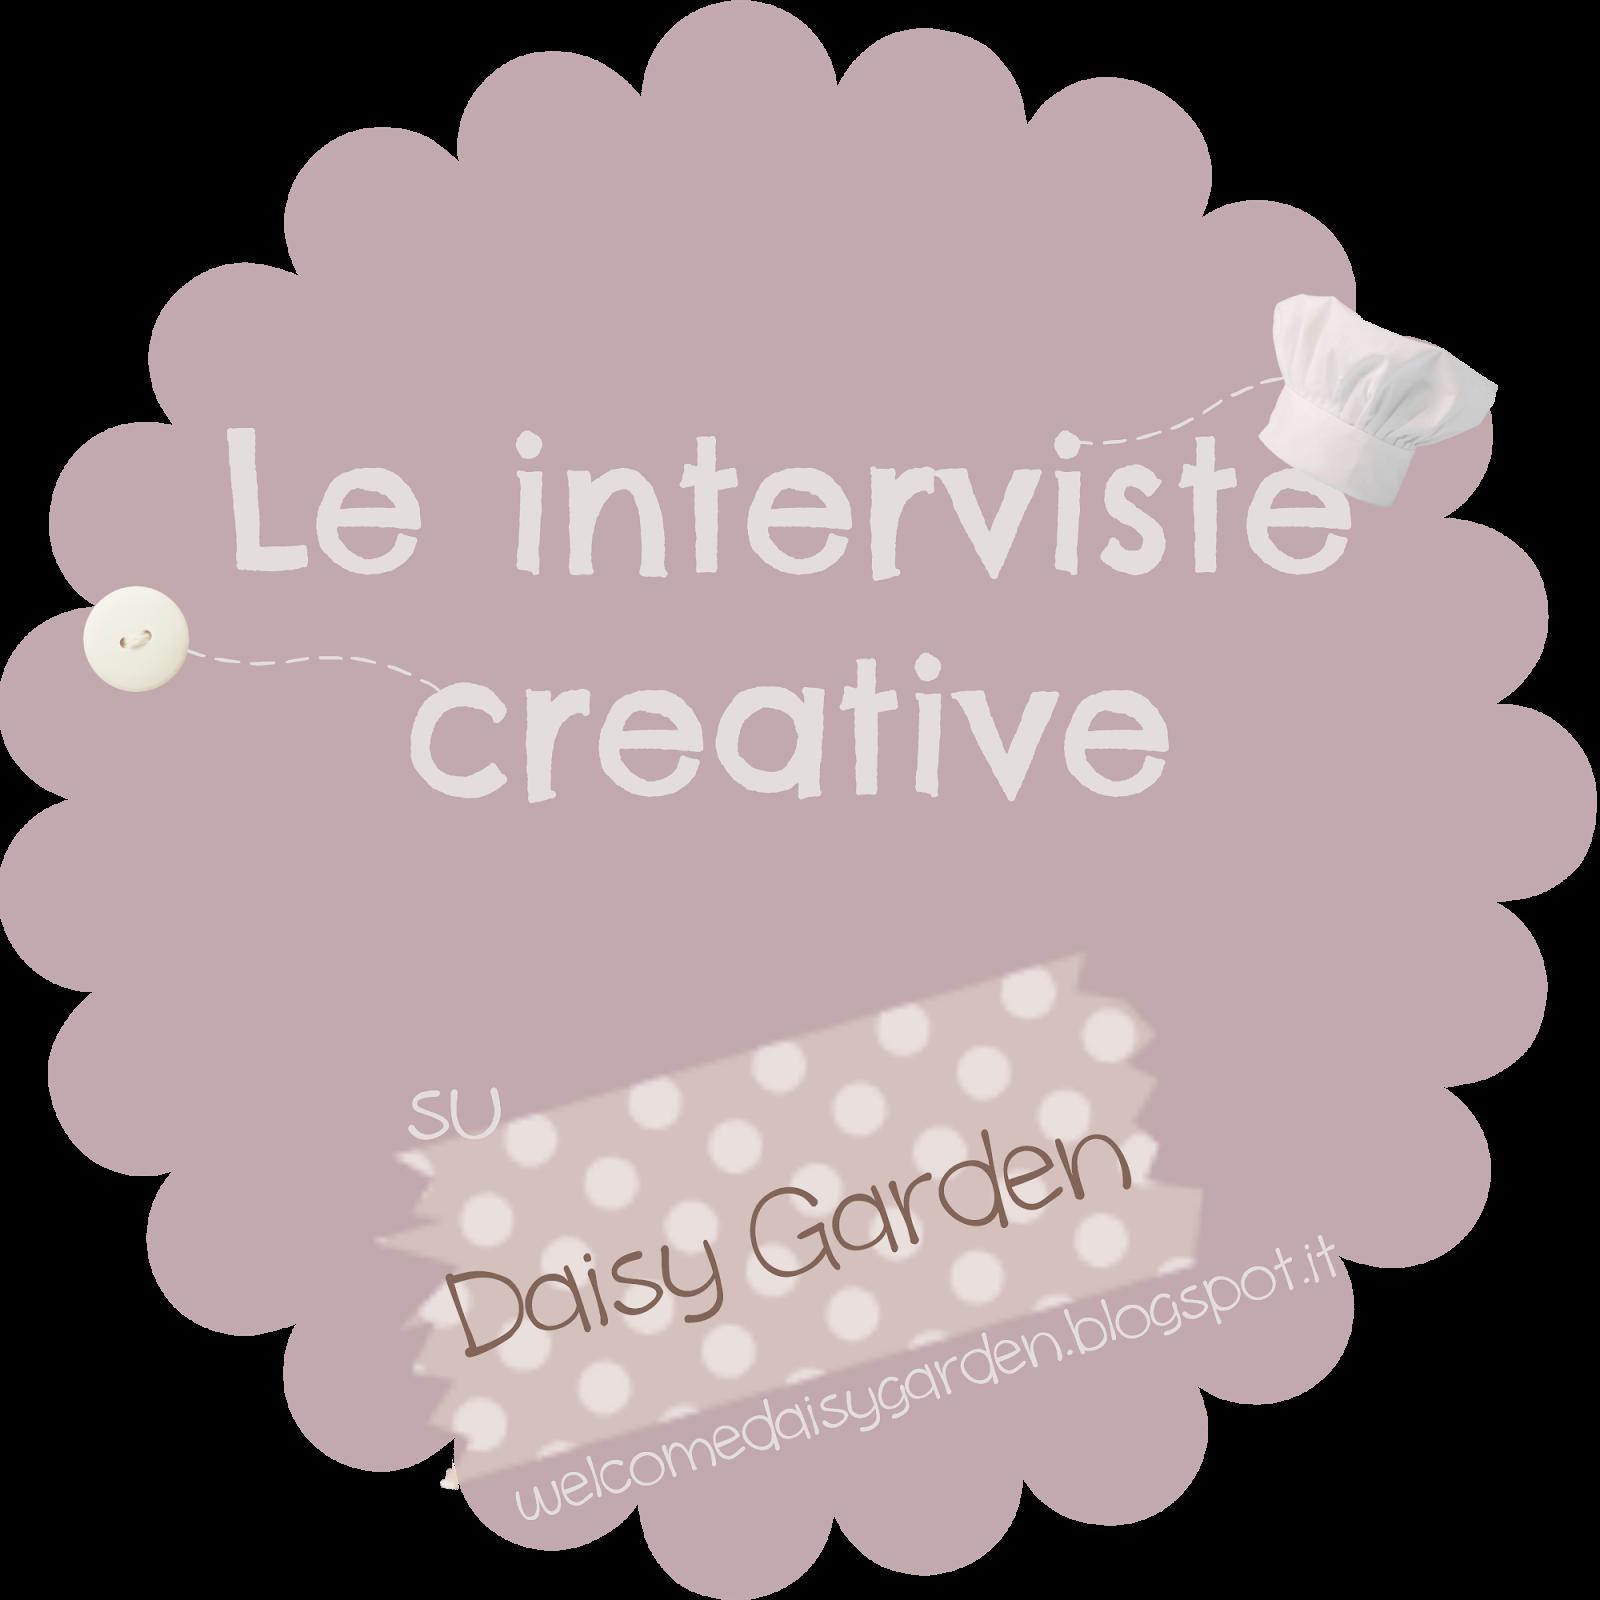 Le interviste creative